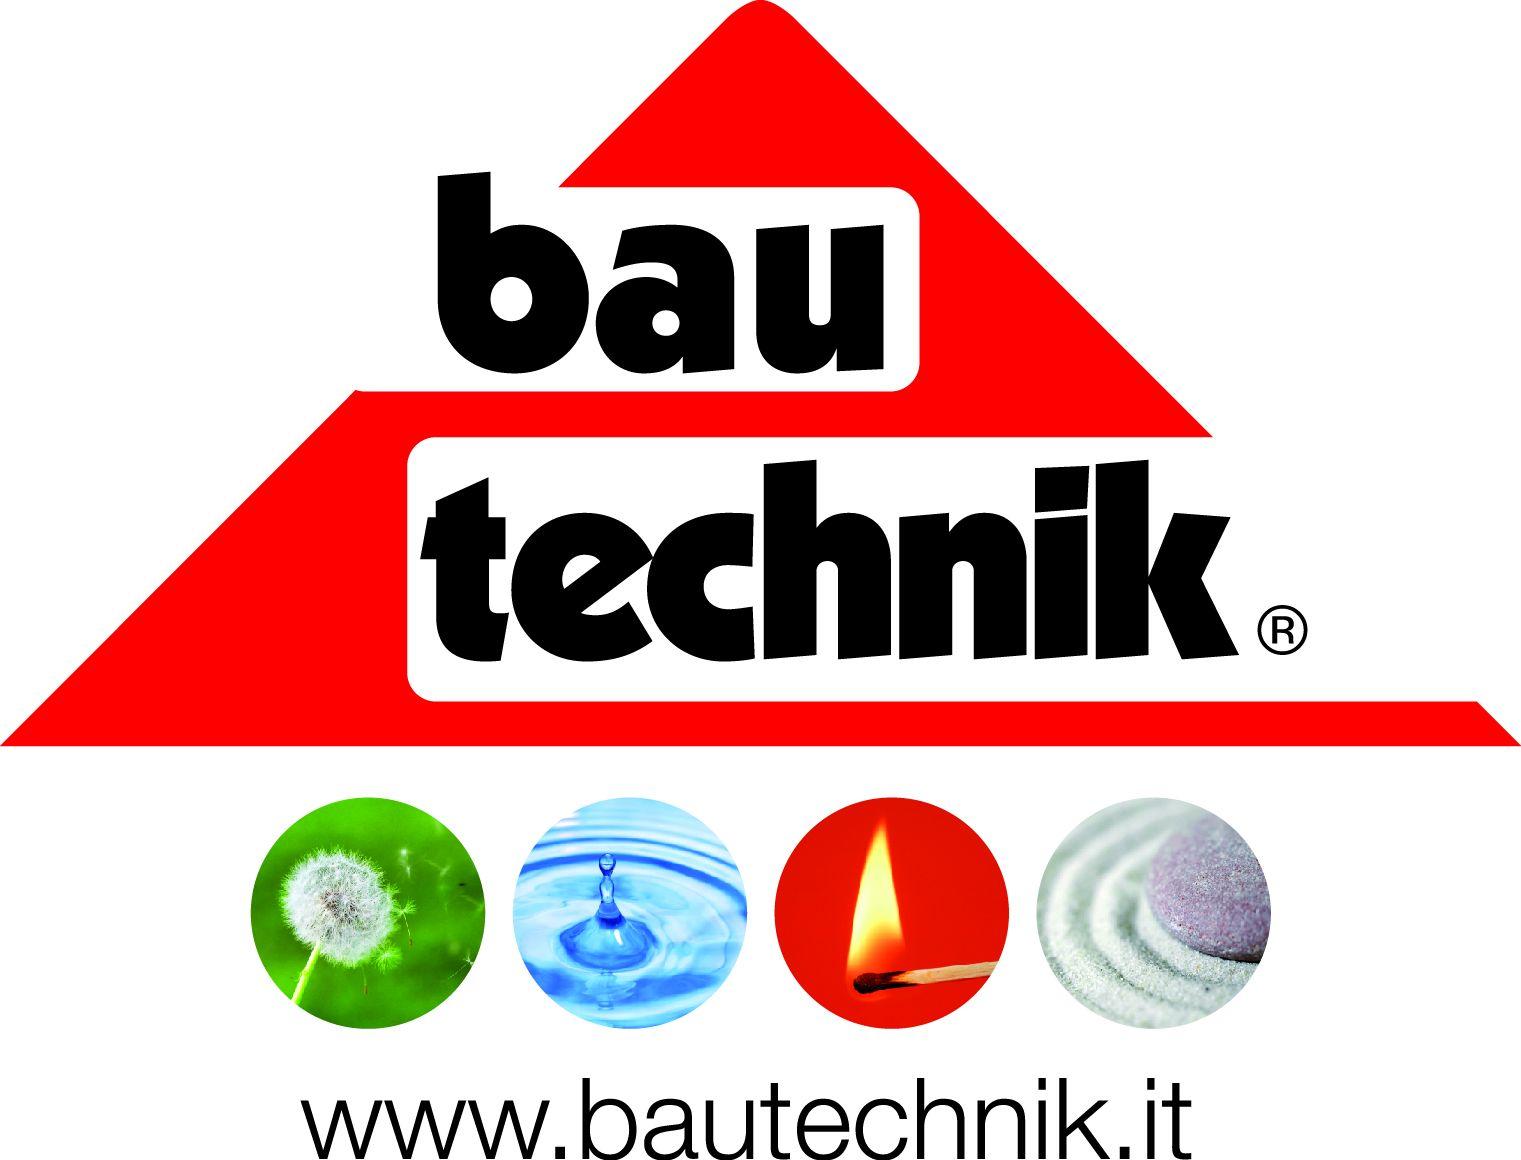 Logo_bautechnik_4_elementi.jpg